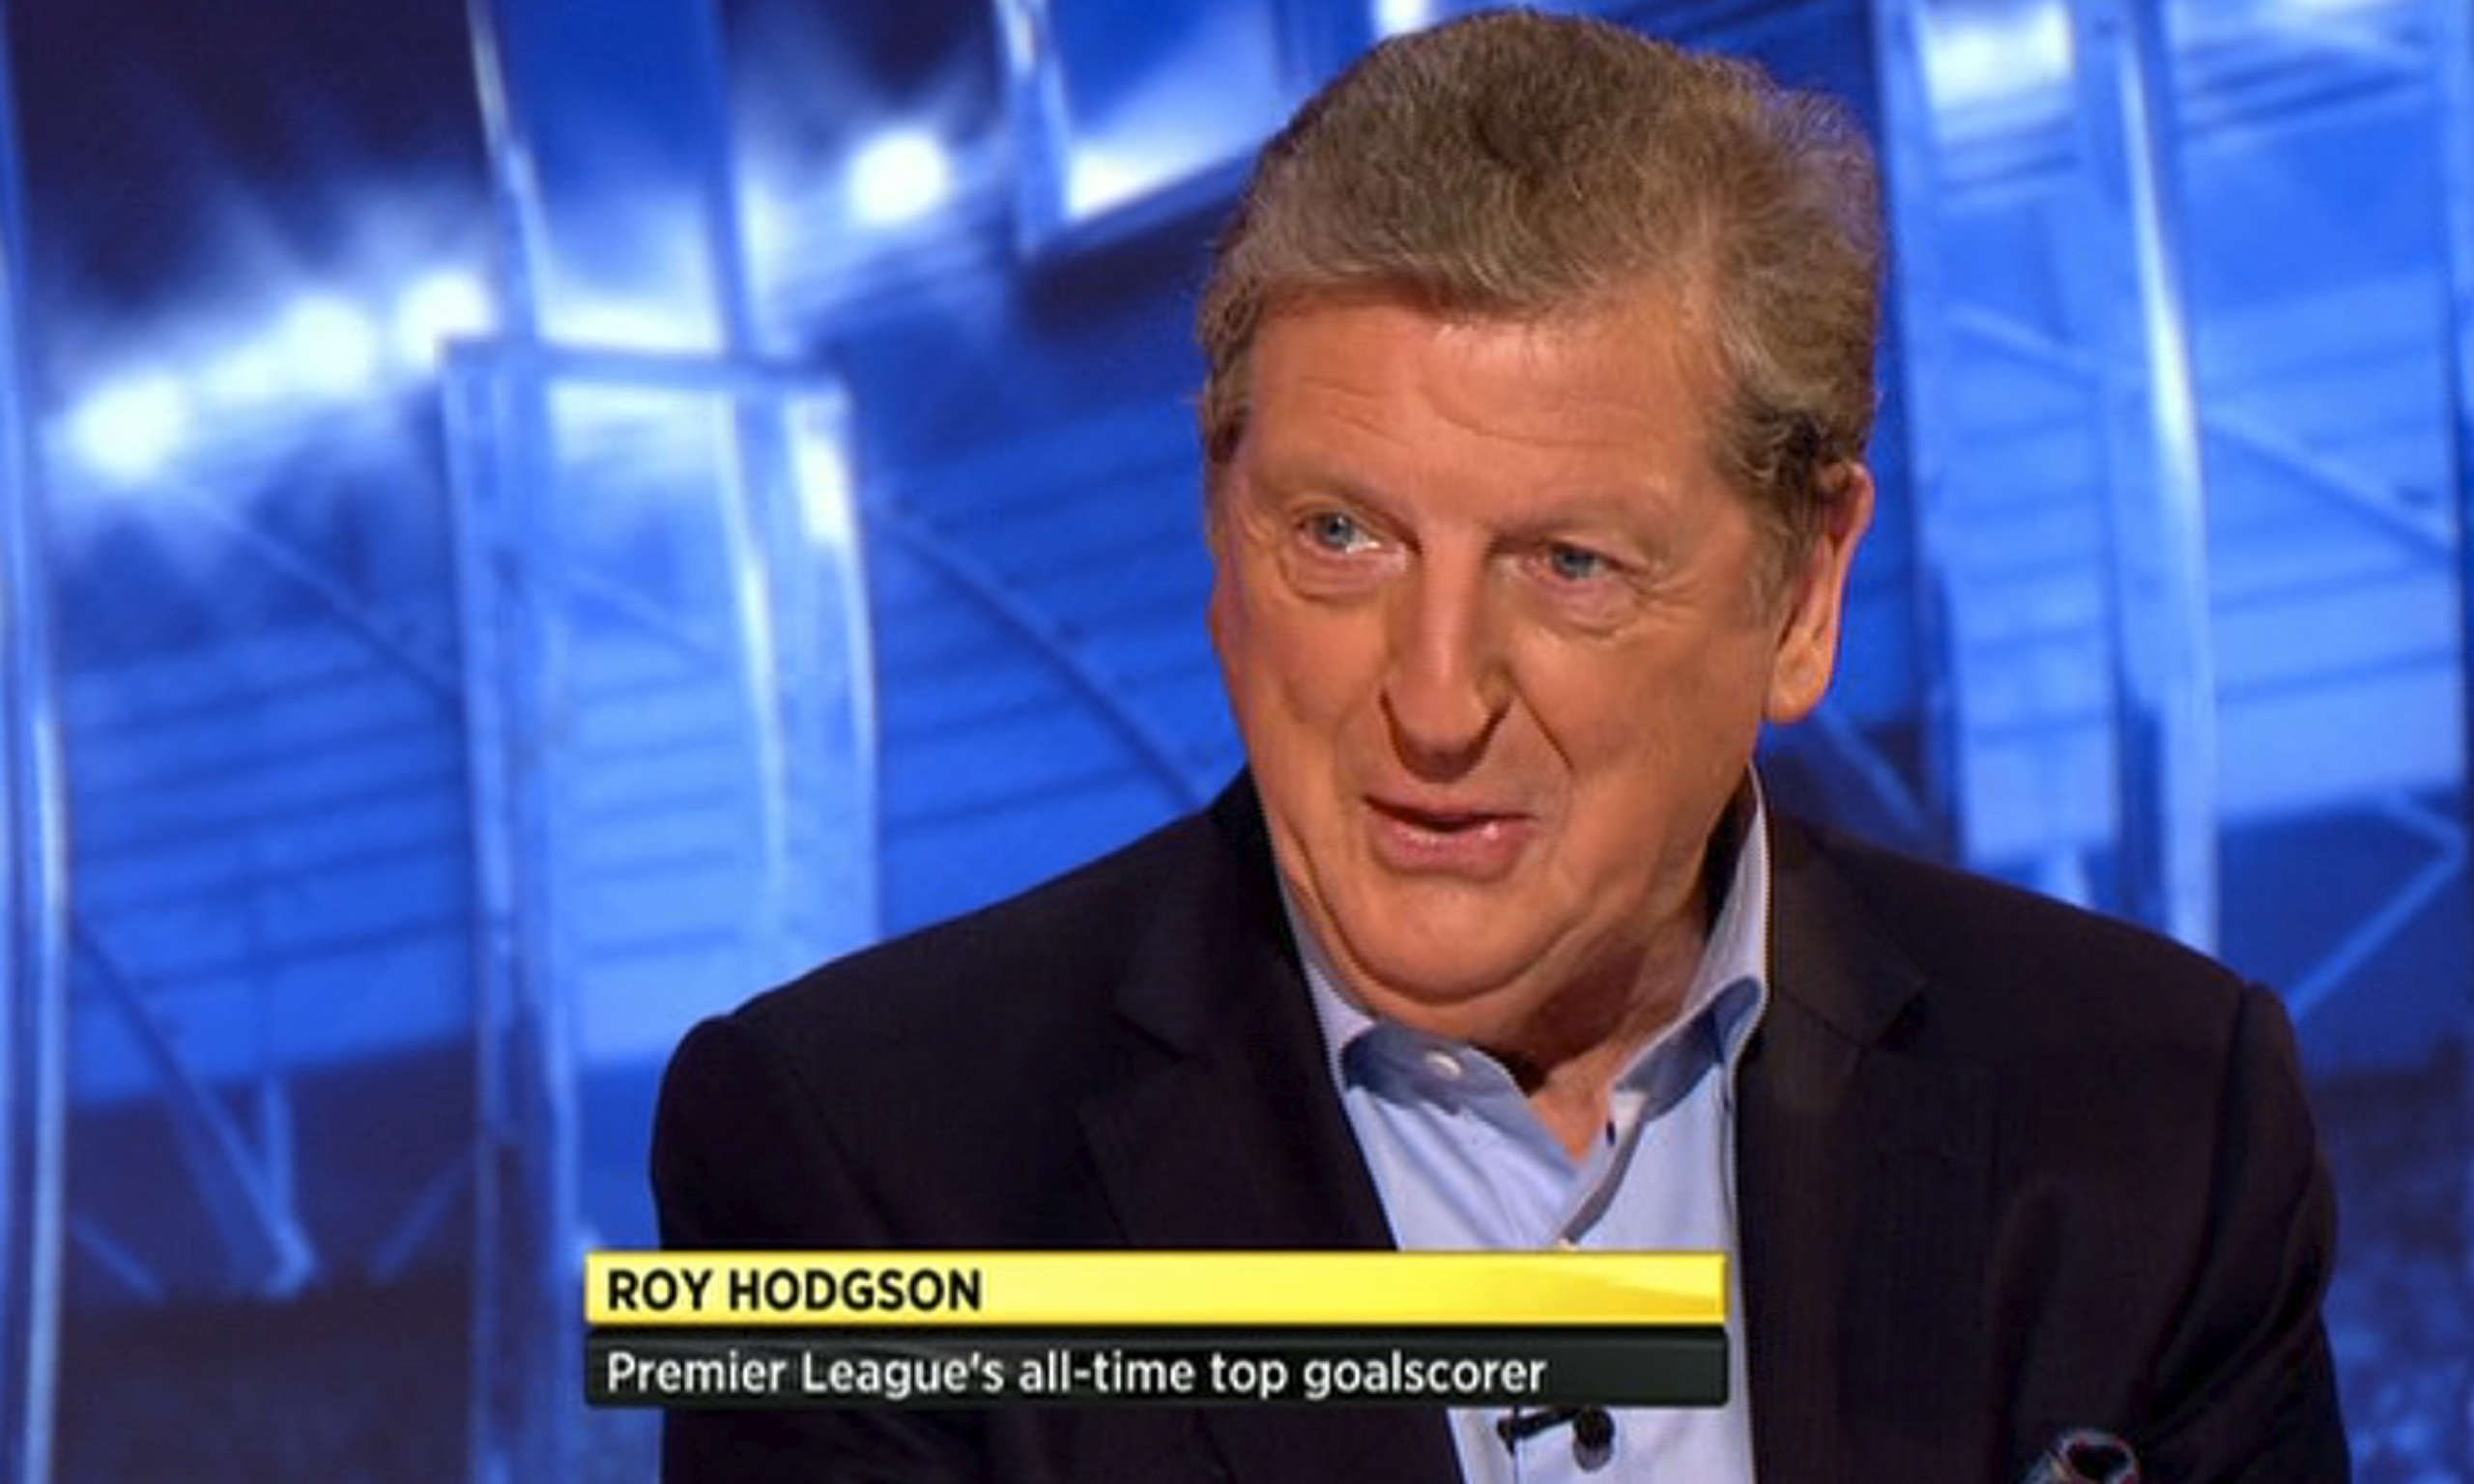 Roy Hodgson Admits Feeling The